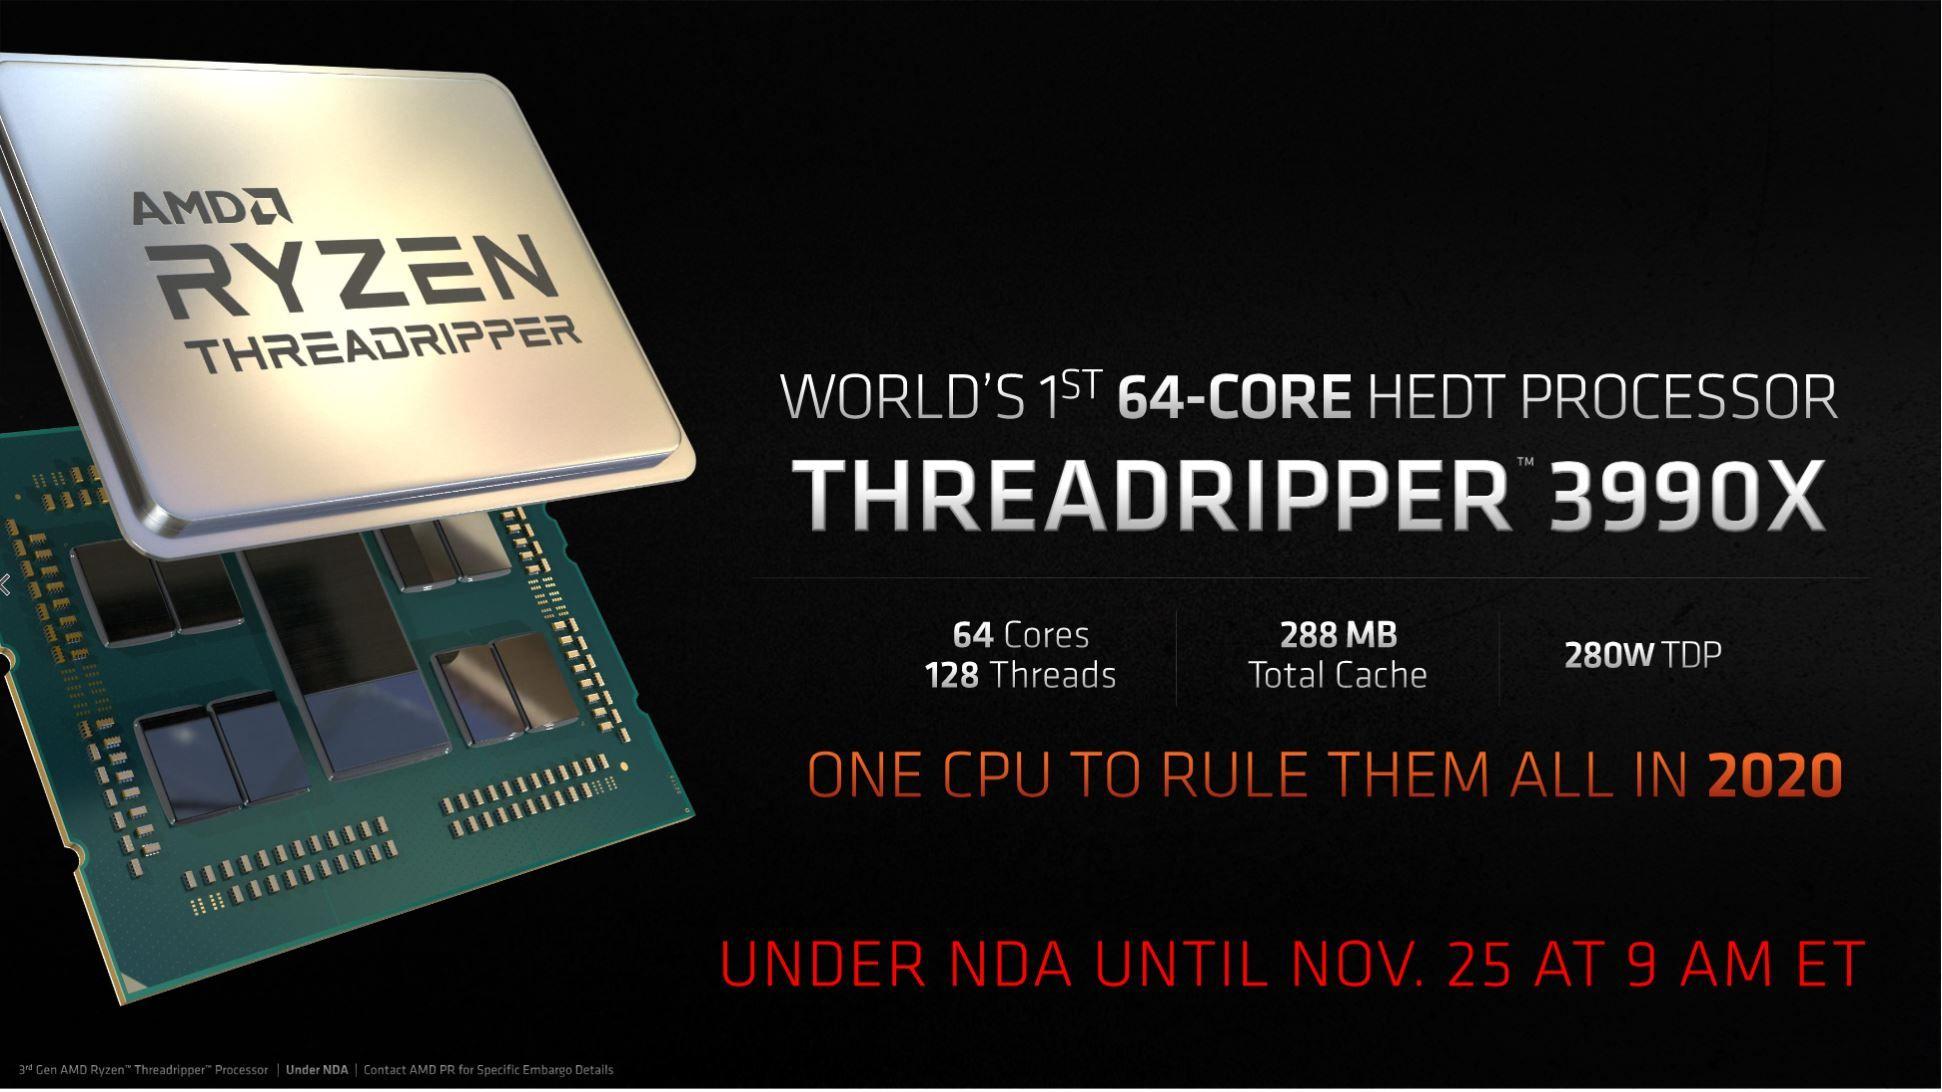 «One CPU to rule them all»... ingen nåde fra AMD.